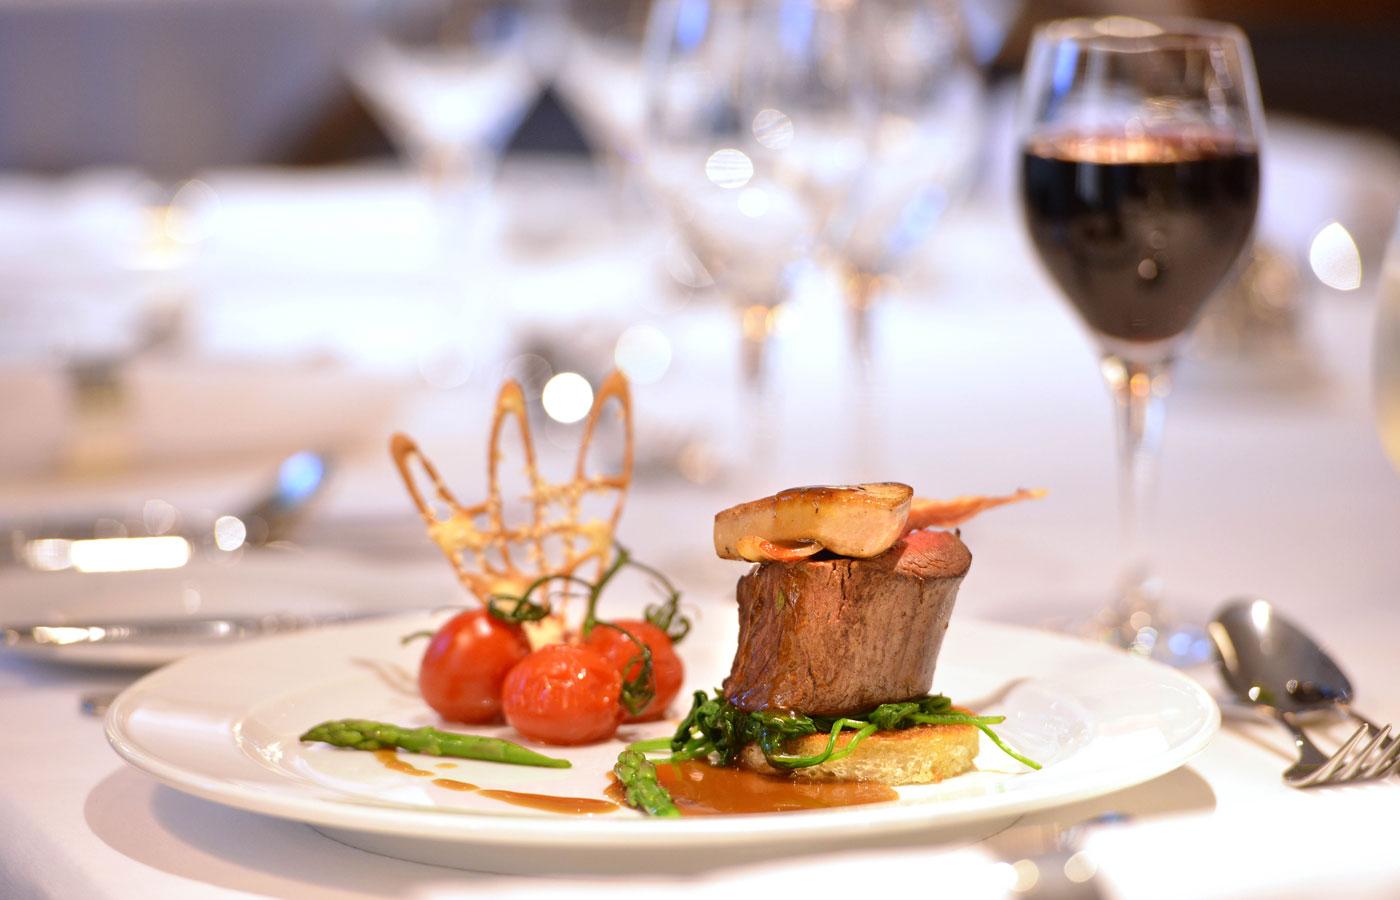 Refined gourmet cuisine aboard the Island Sky luxury cruise ship